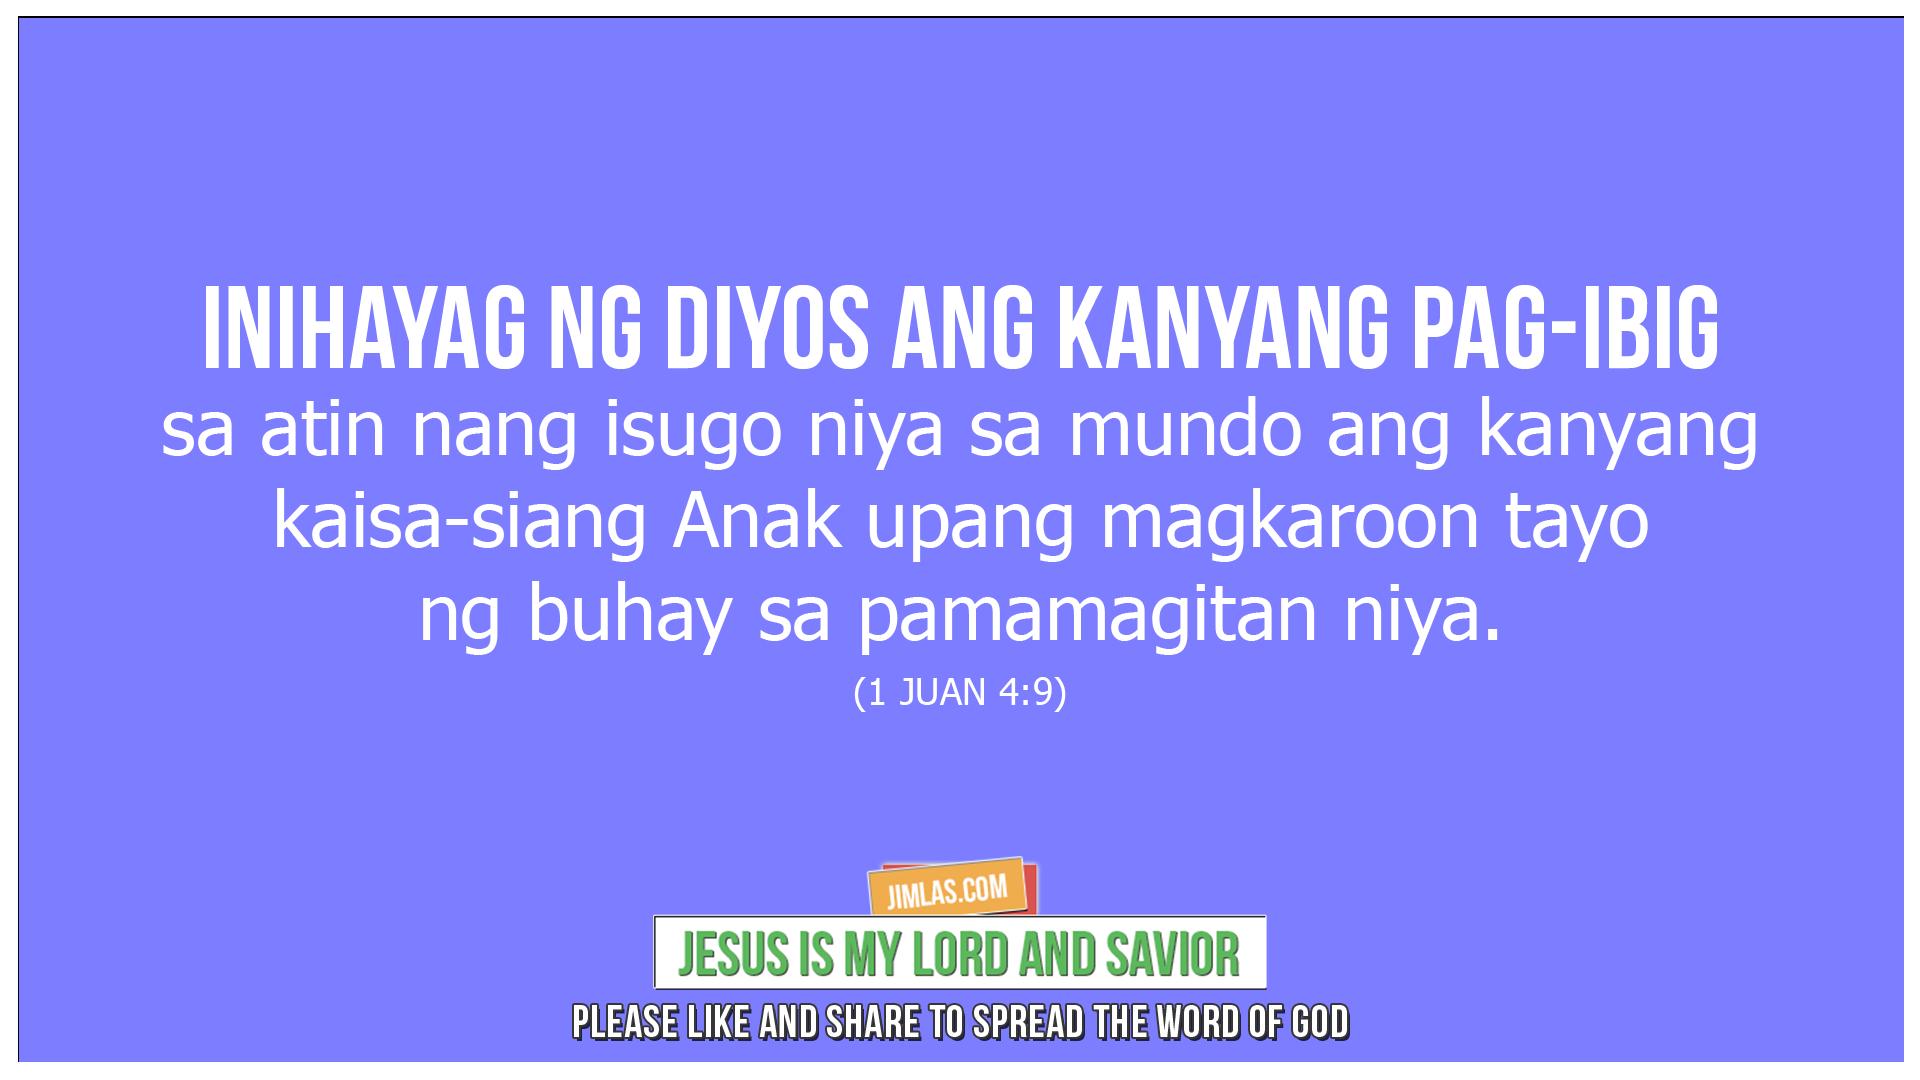 1 juan 4 9, 1 Juan 4:9